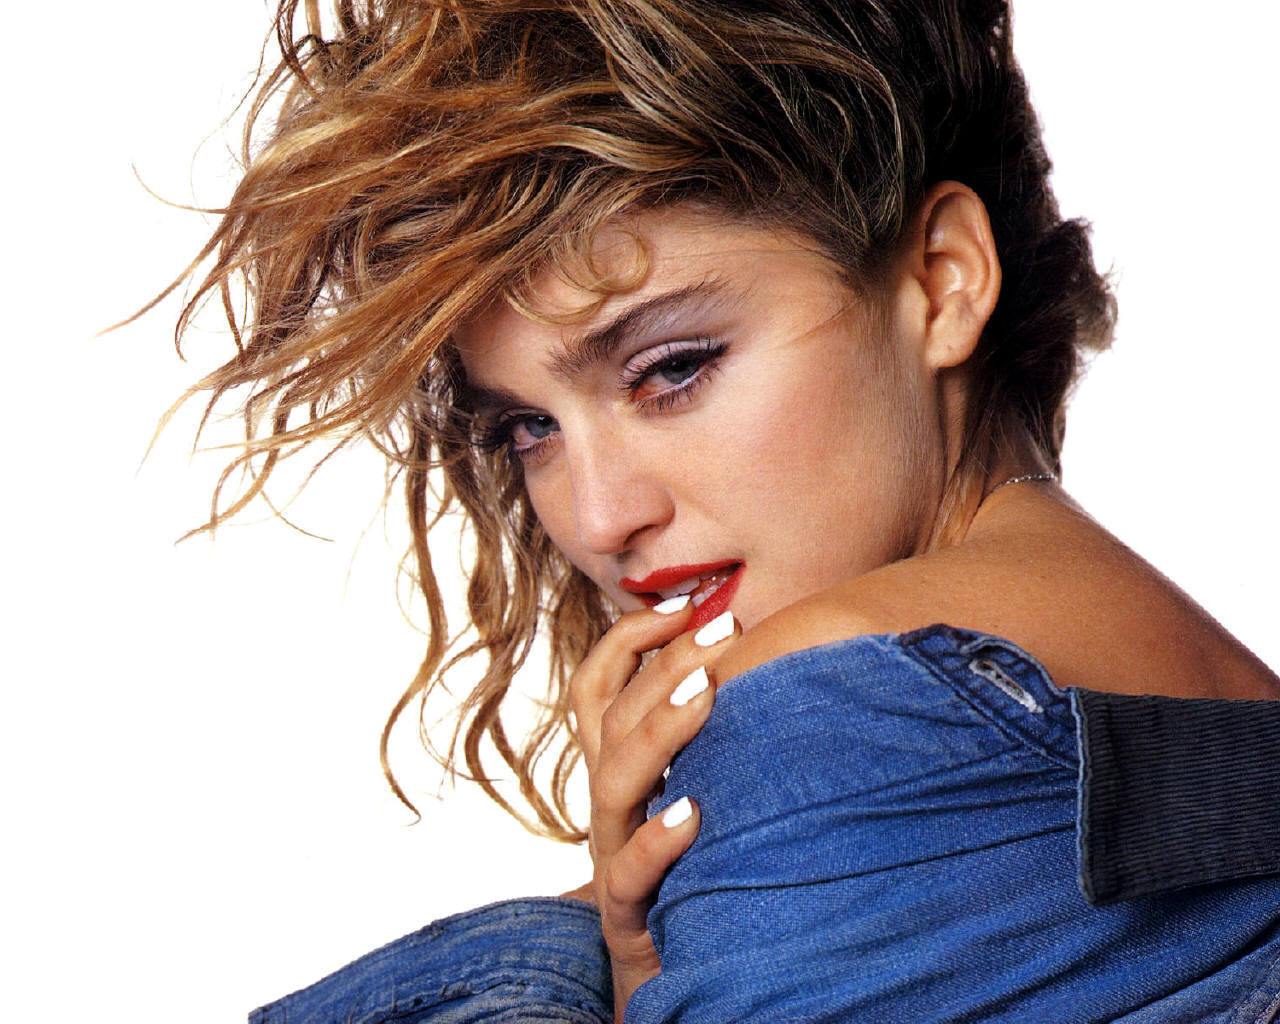 Ecco tutti i Madonna Hairstyle! 21